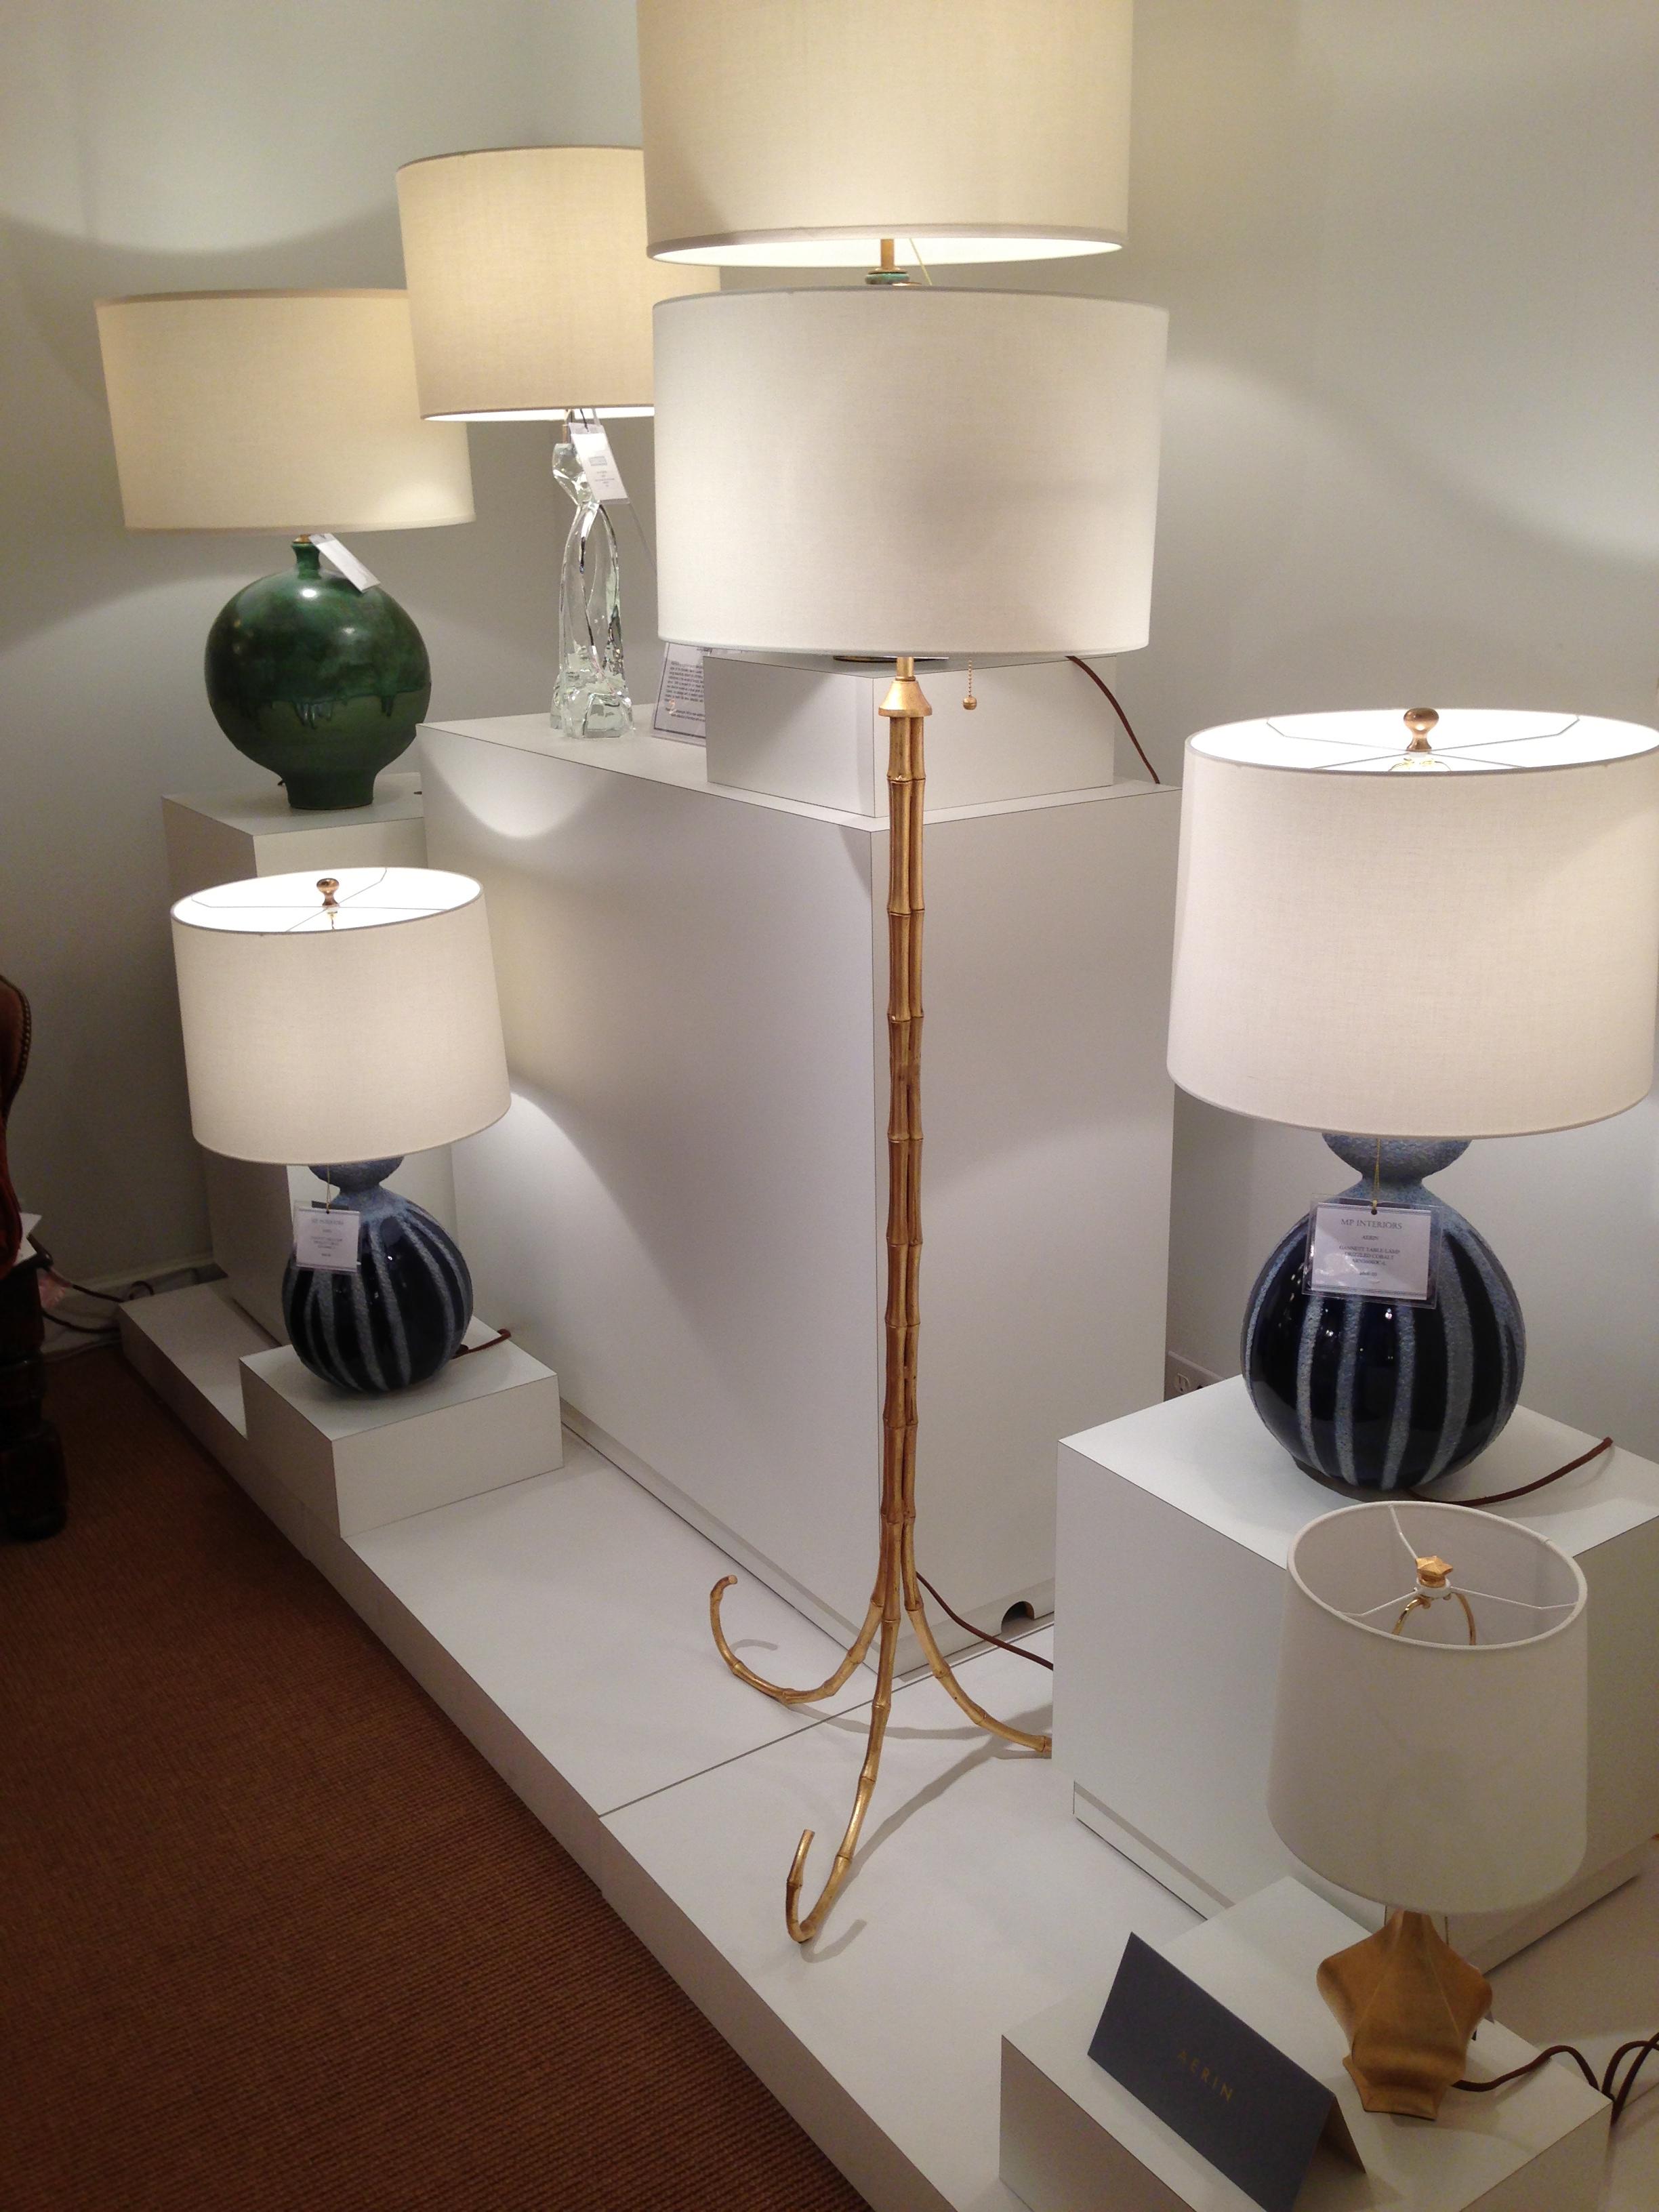 lamp table furniture set cliff lighting lamps designer lauder lig aerin viyet